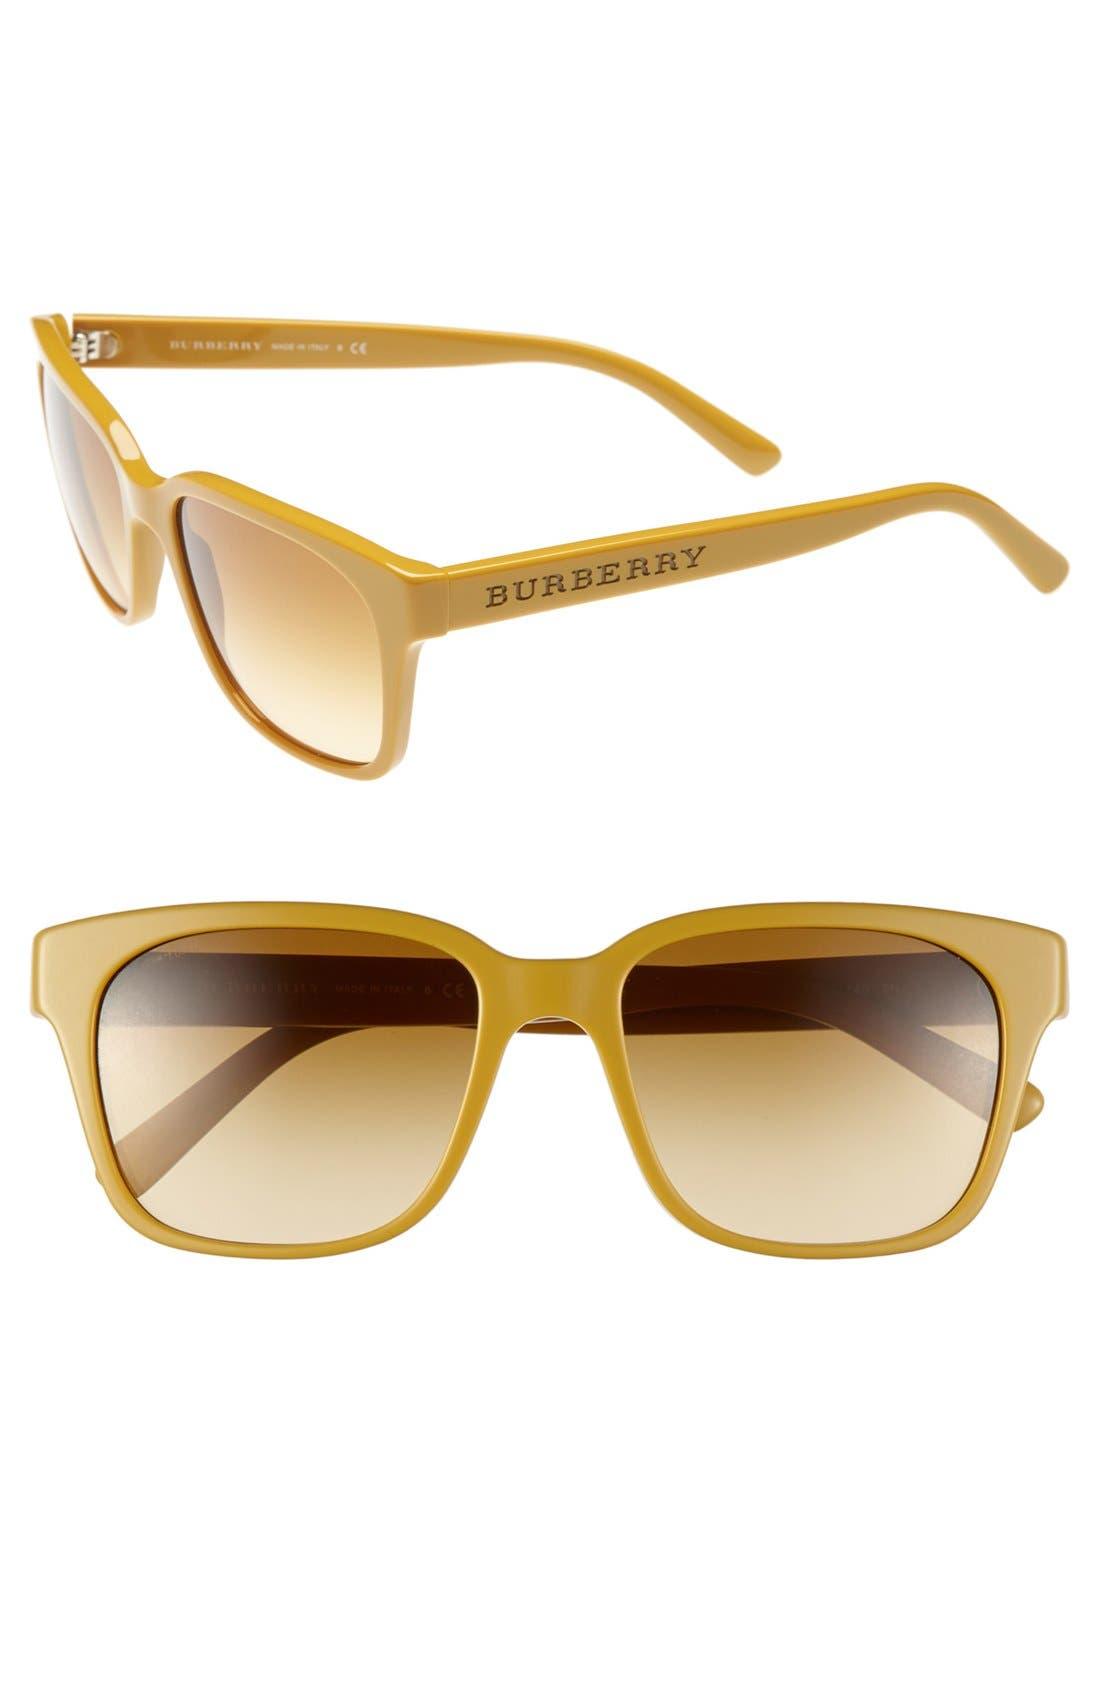 Main Image - Burberry 'Splash' 55mm Sunglasses